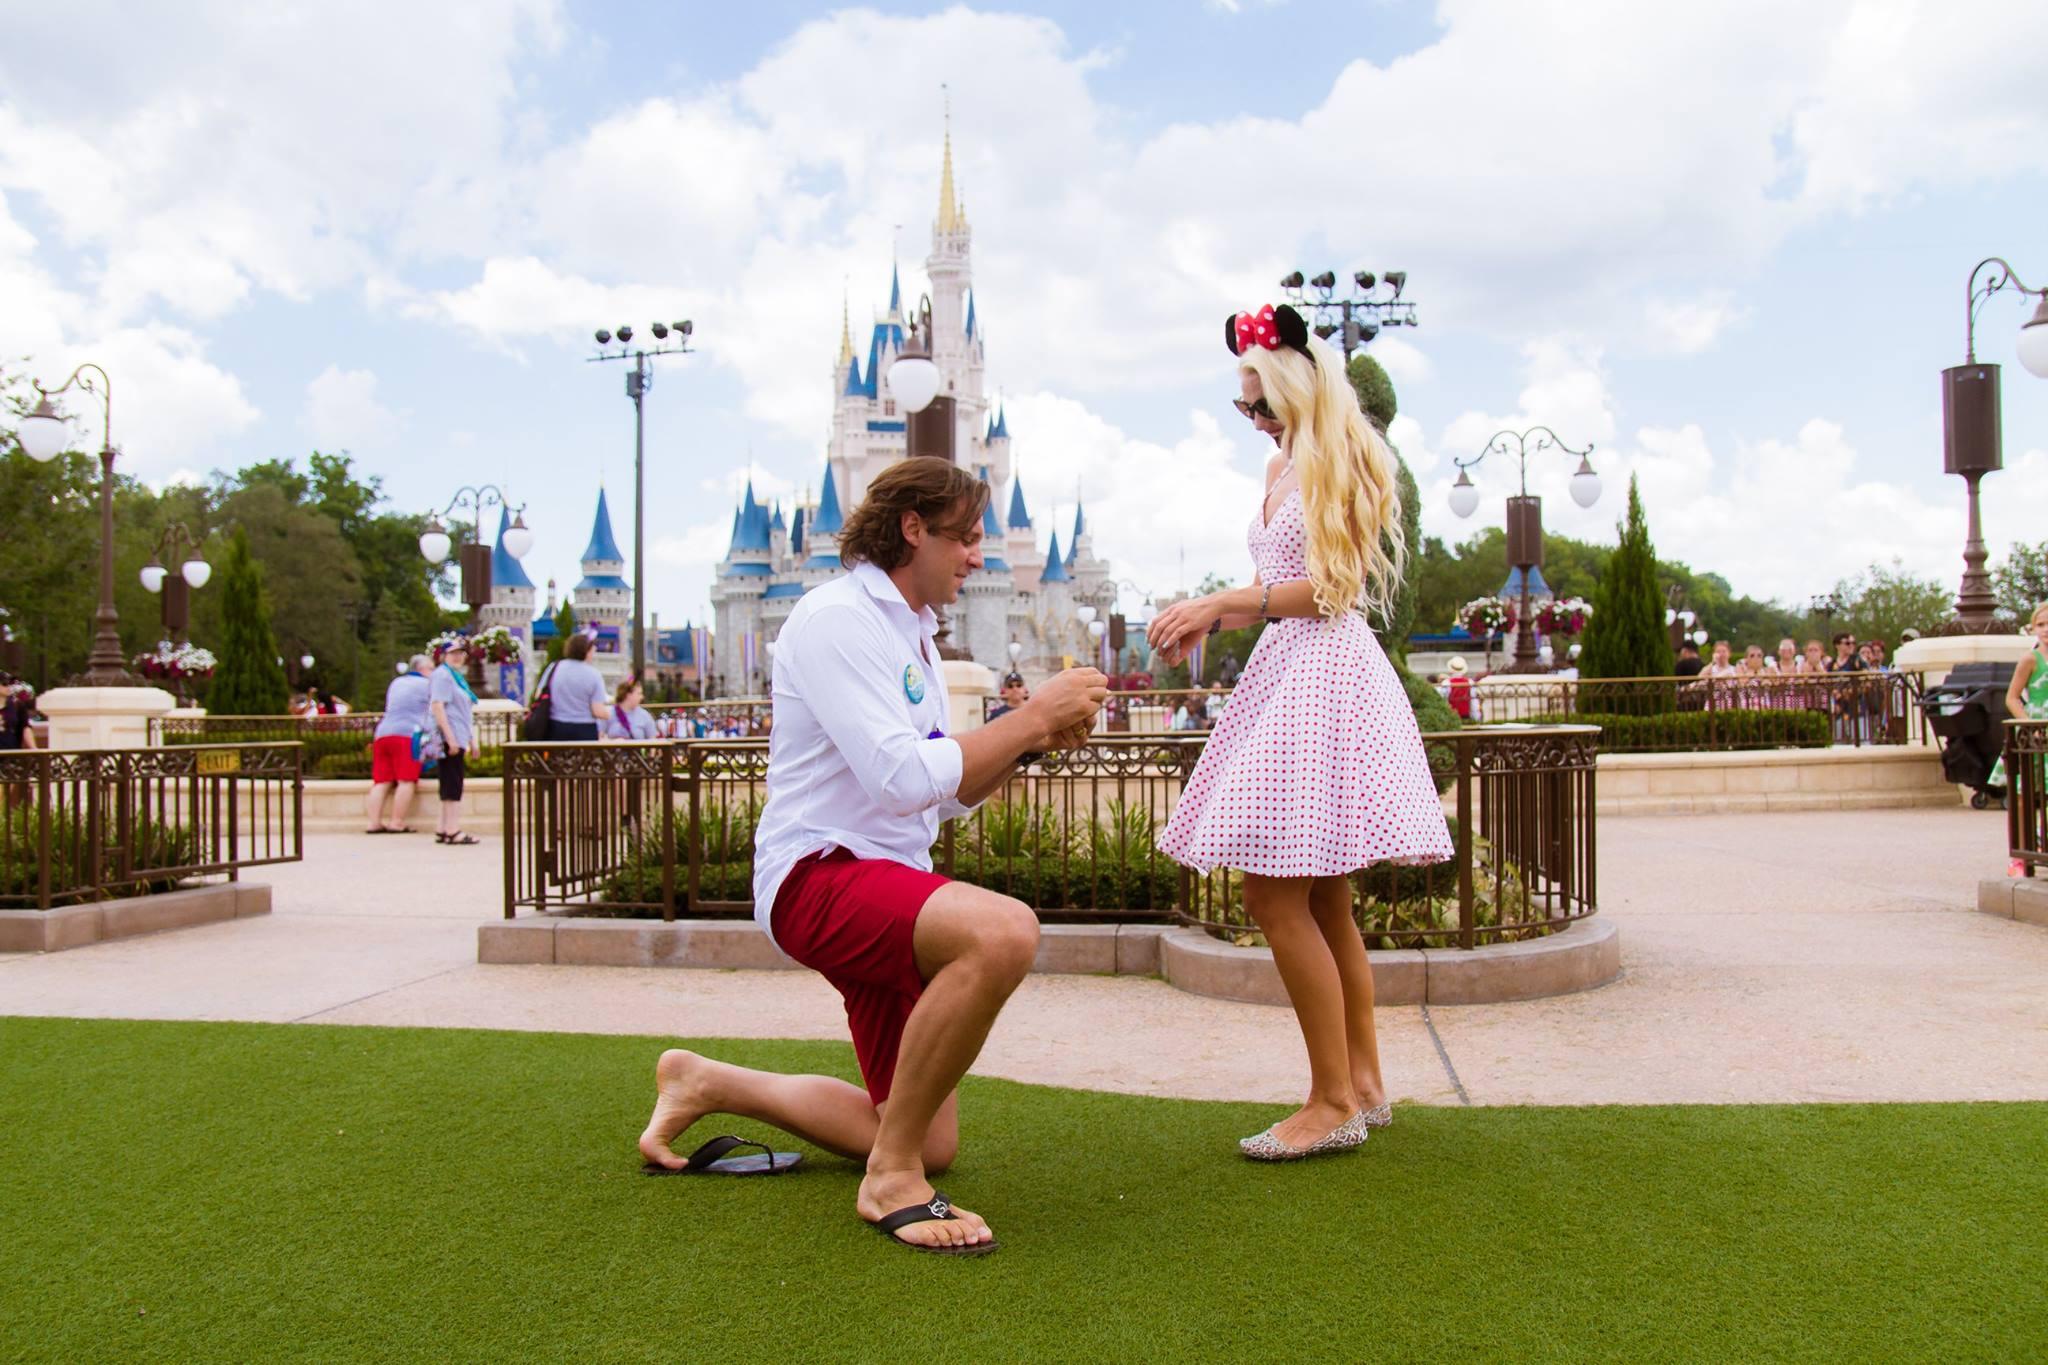 Disney Magic Kingdom Marriage Proposal